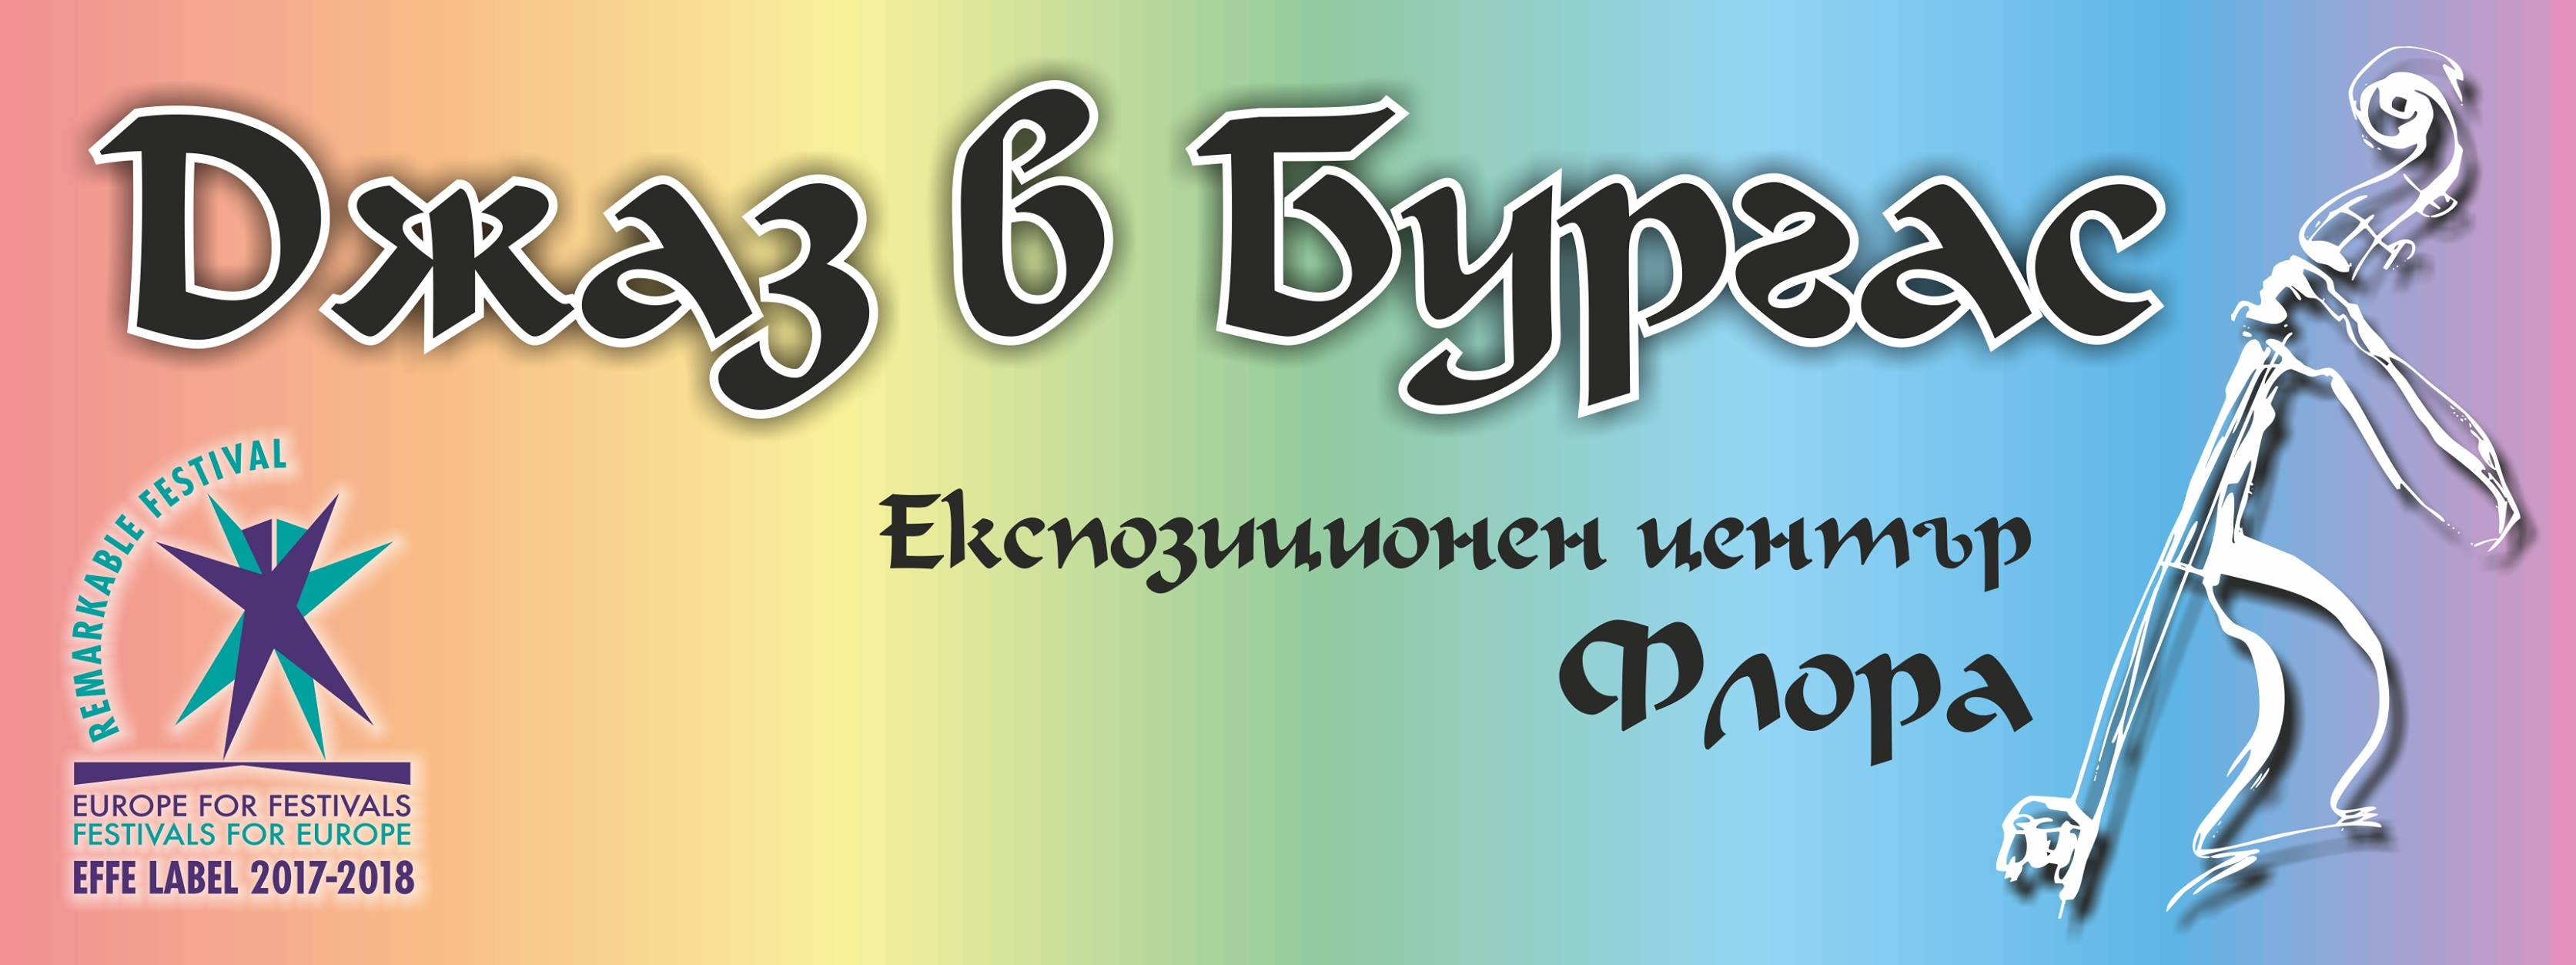 "Festival ""Jazz in Burgas"" 2021"